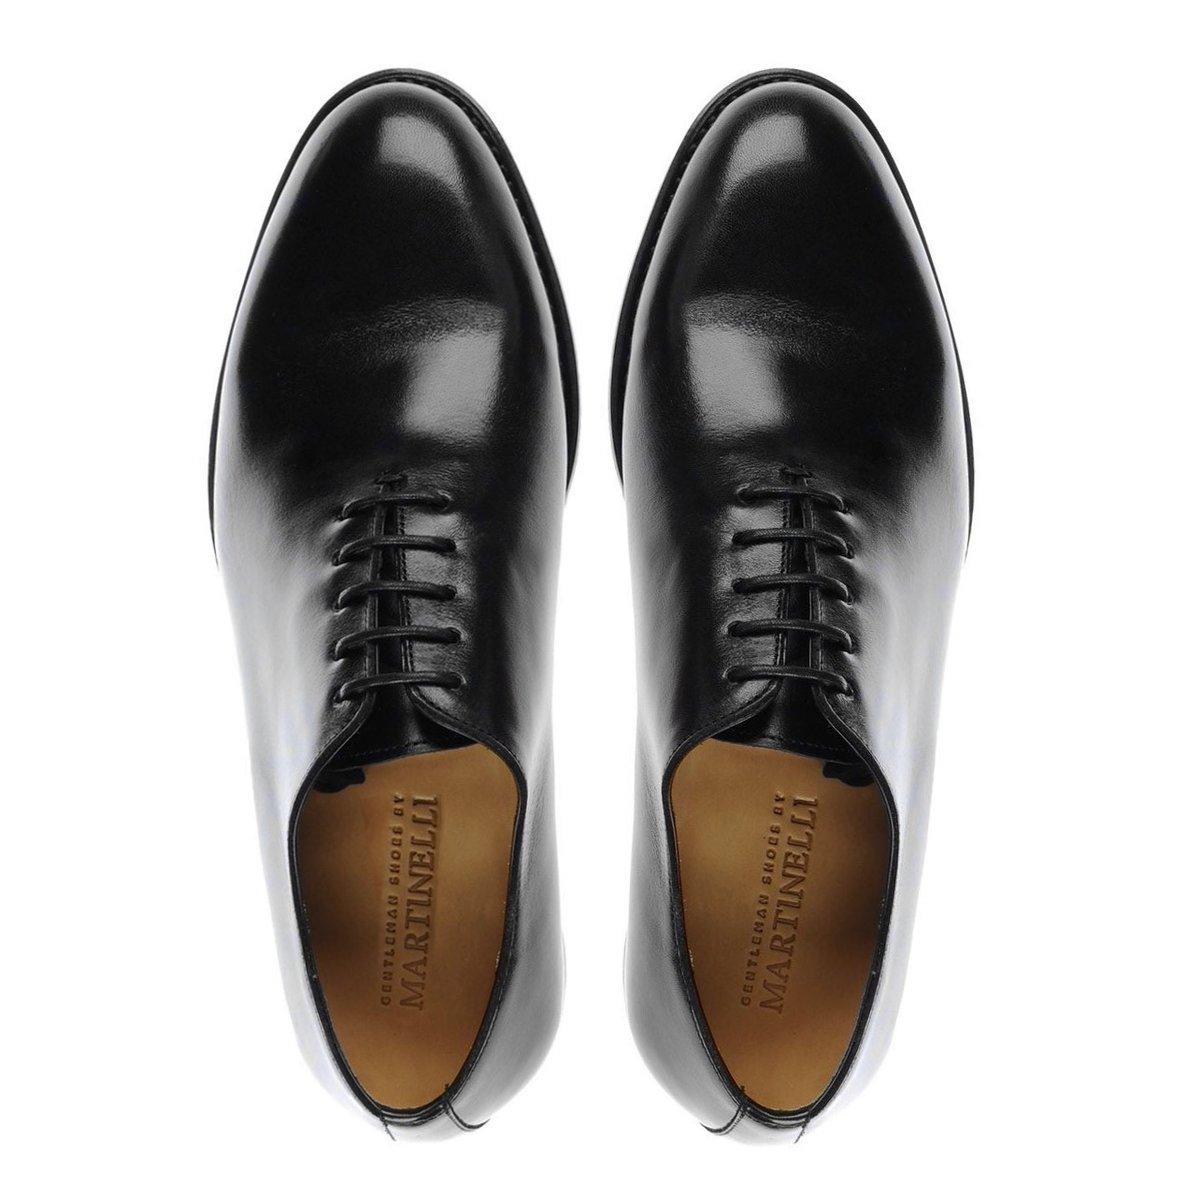 Martinelli shoes 2.jpg